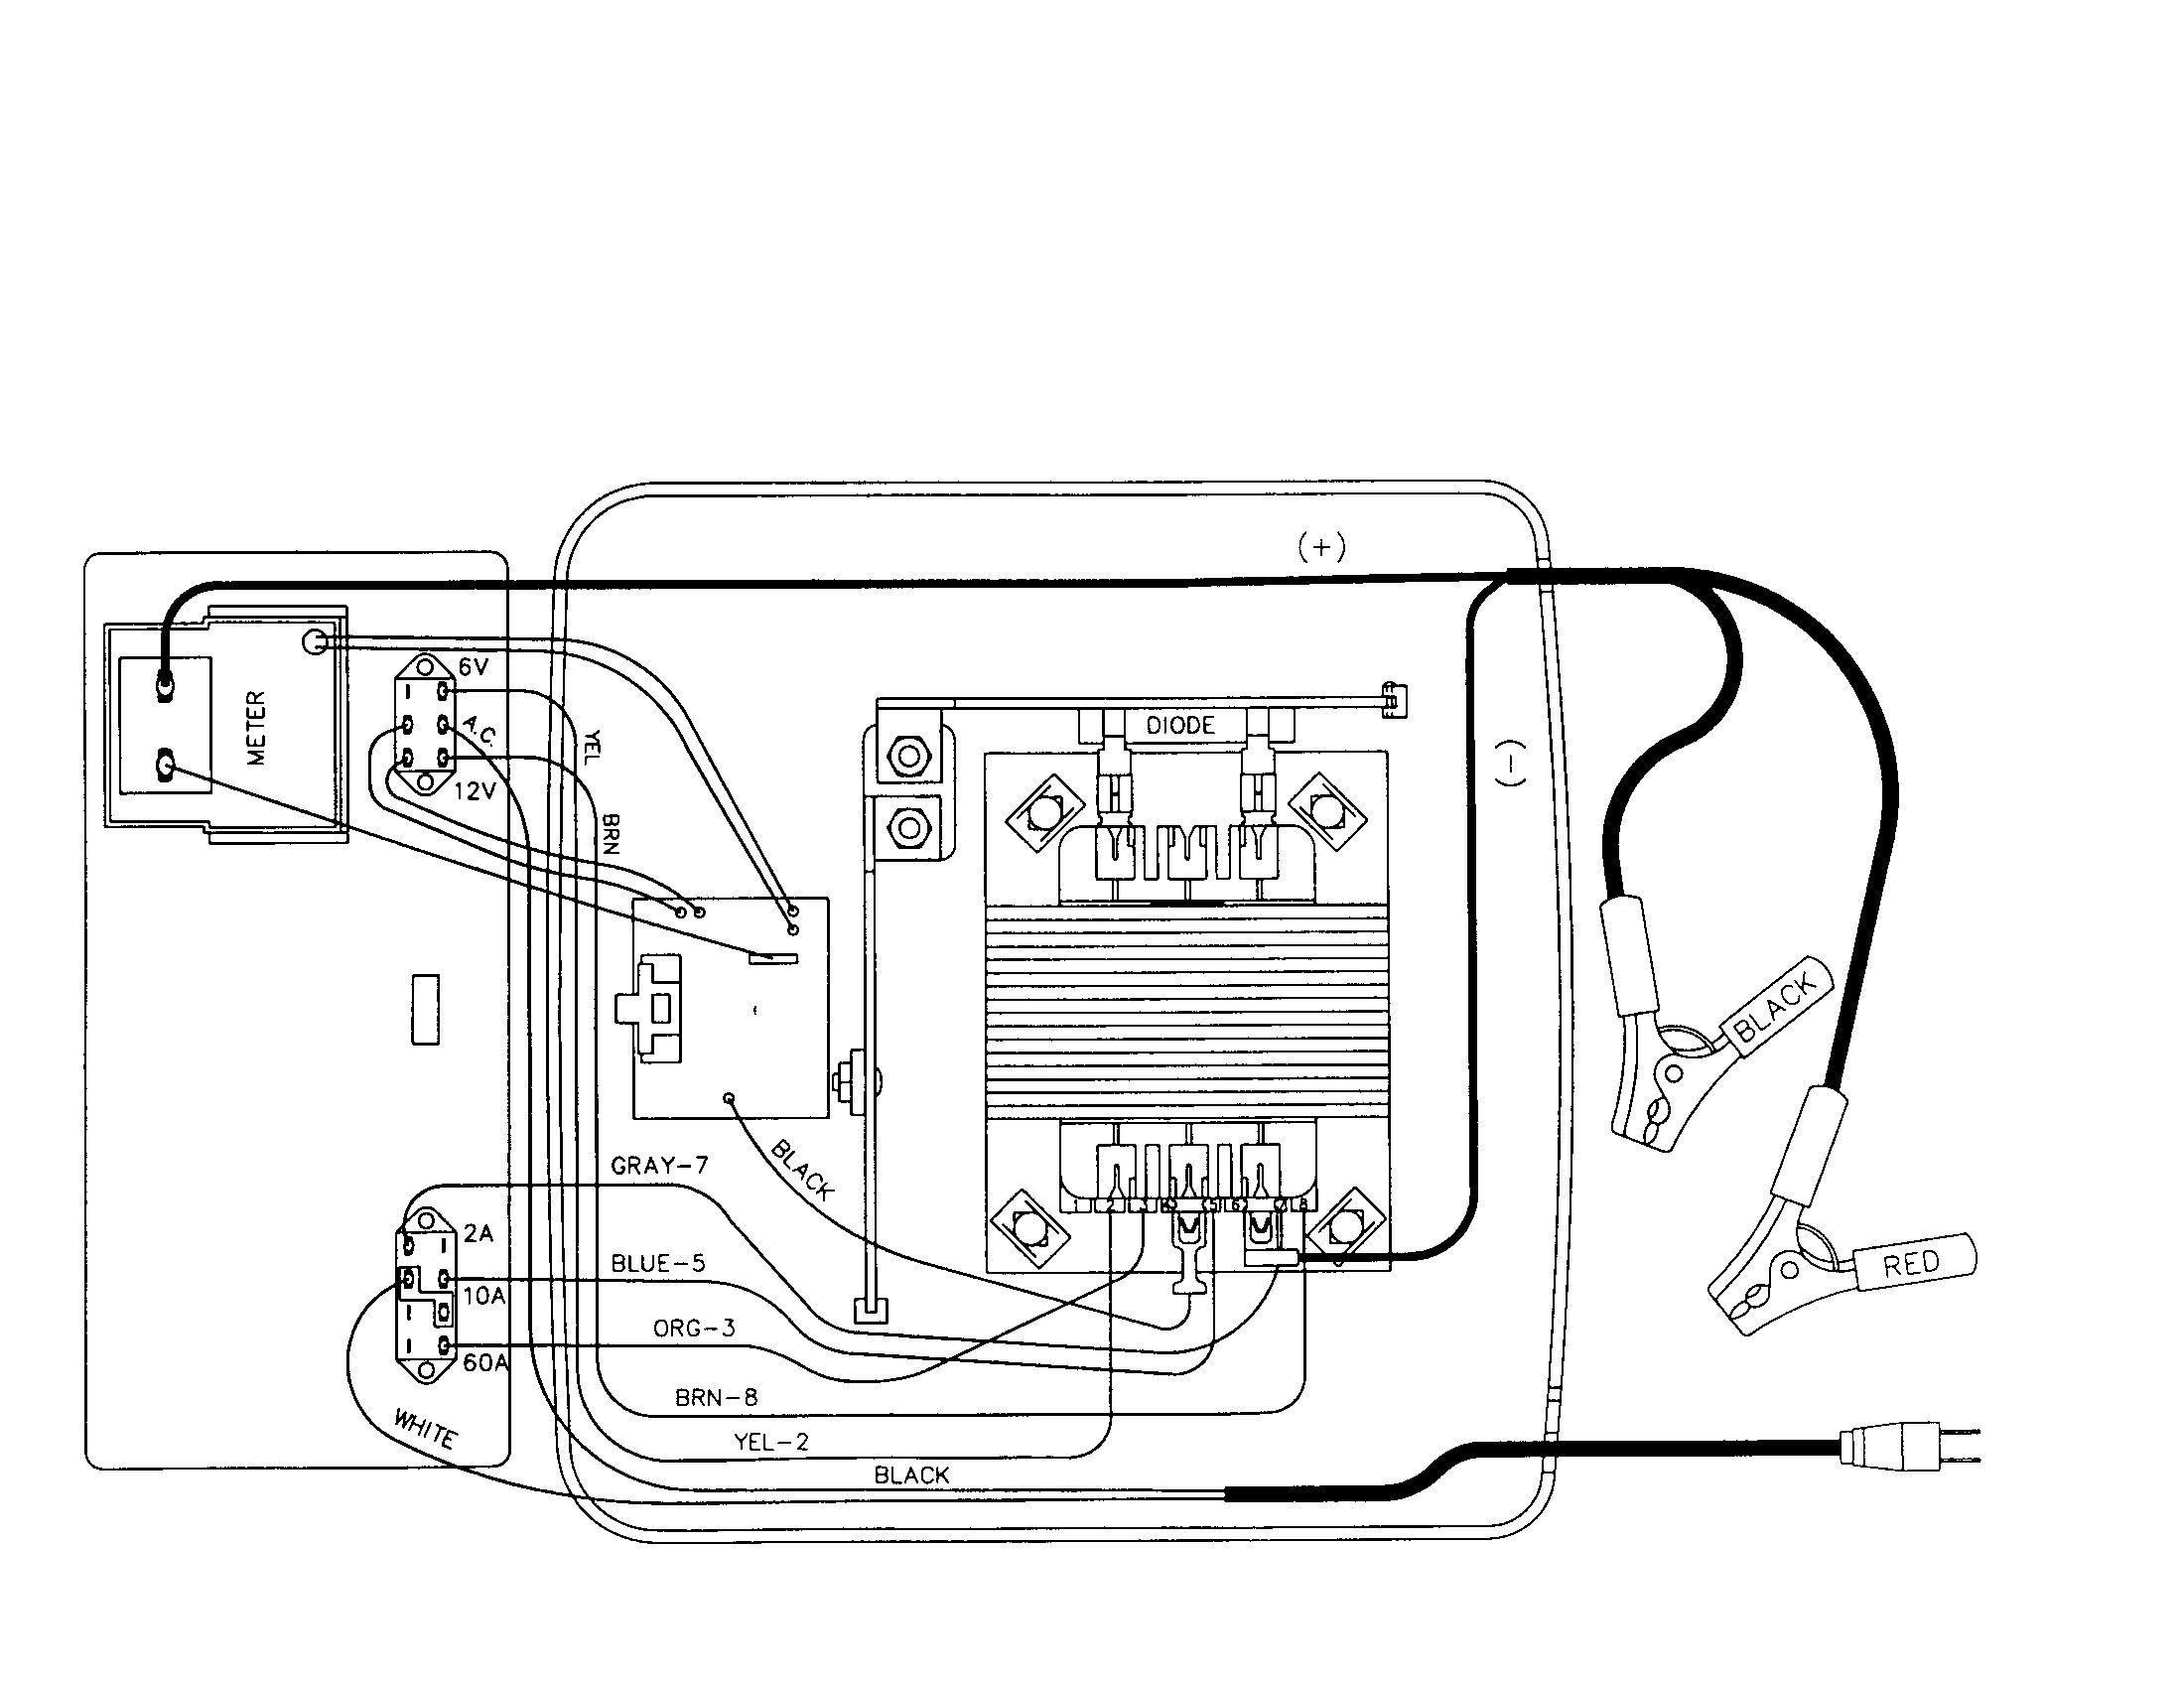 Schumacher Battery Charger Wiring Diagram Scwam New Battery Charger Charger Universal Battery Charger